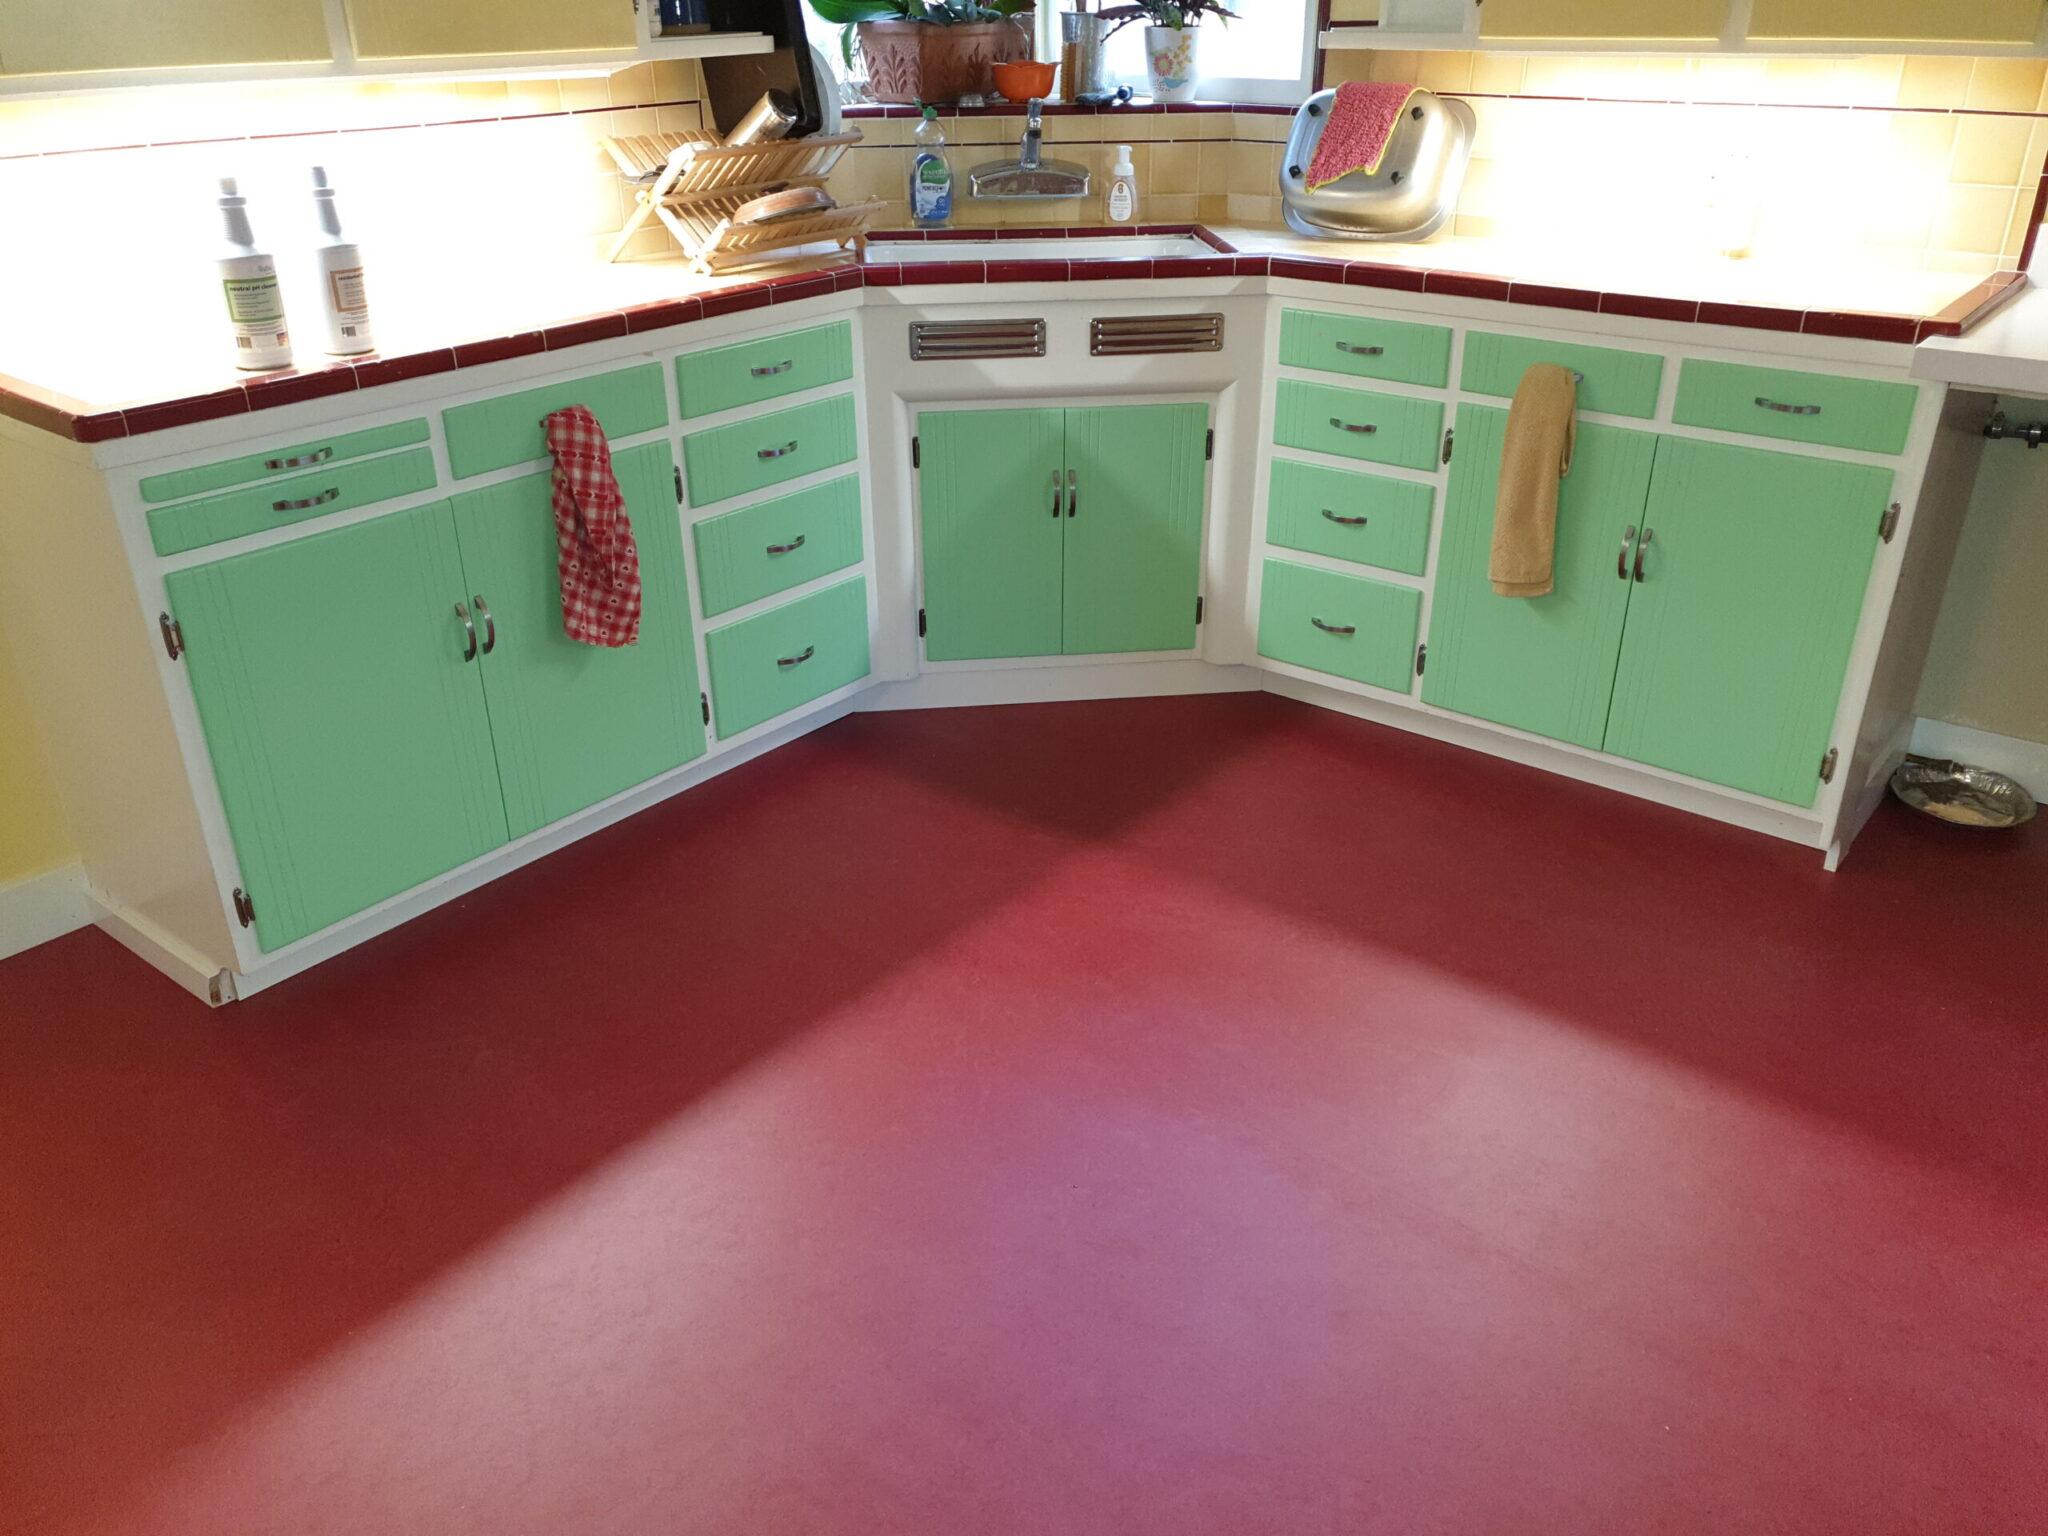 Marmoleum Linoleum Floor Burbank Area San Jose